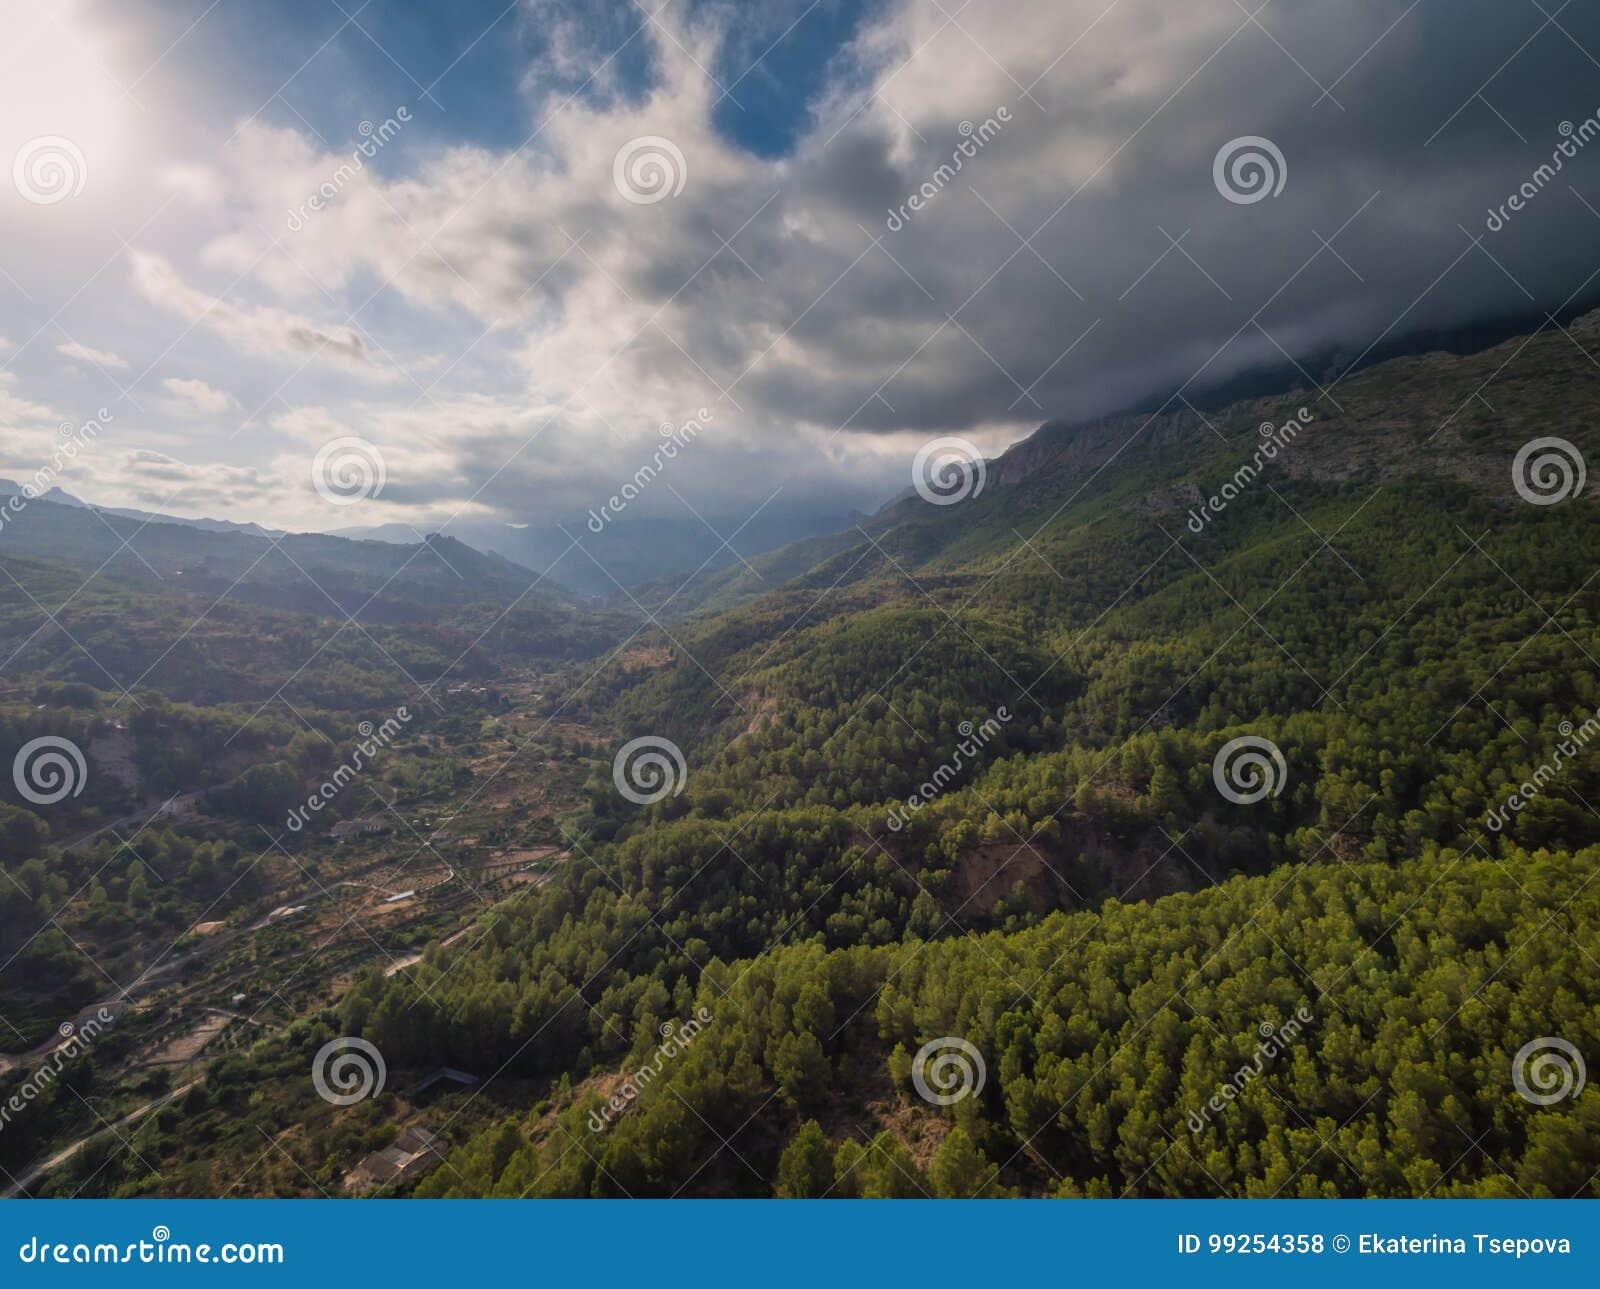 Mediterranean country